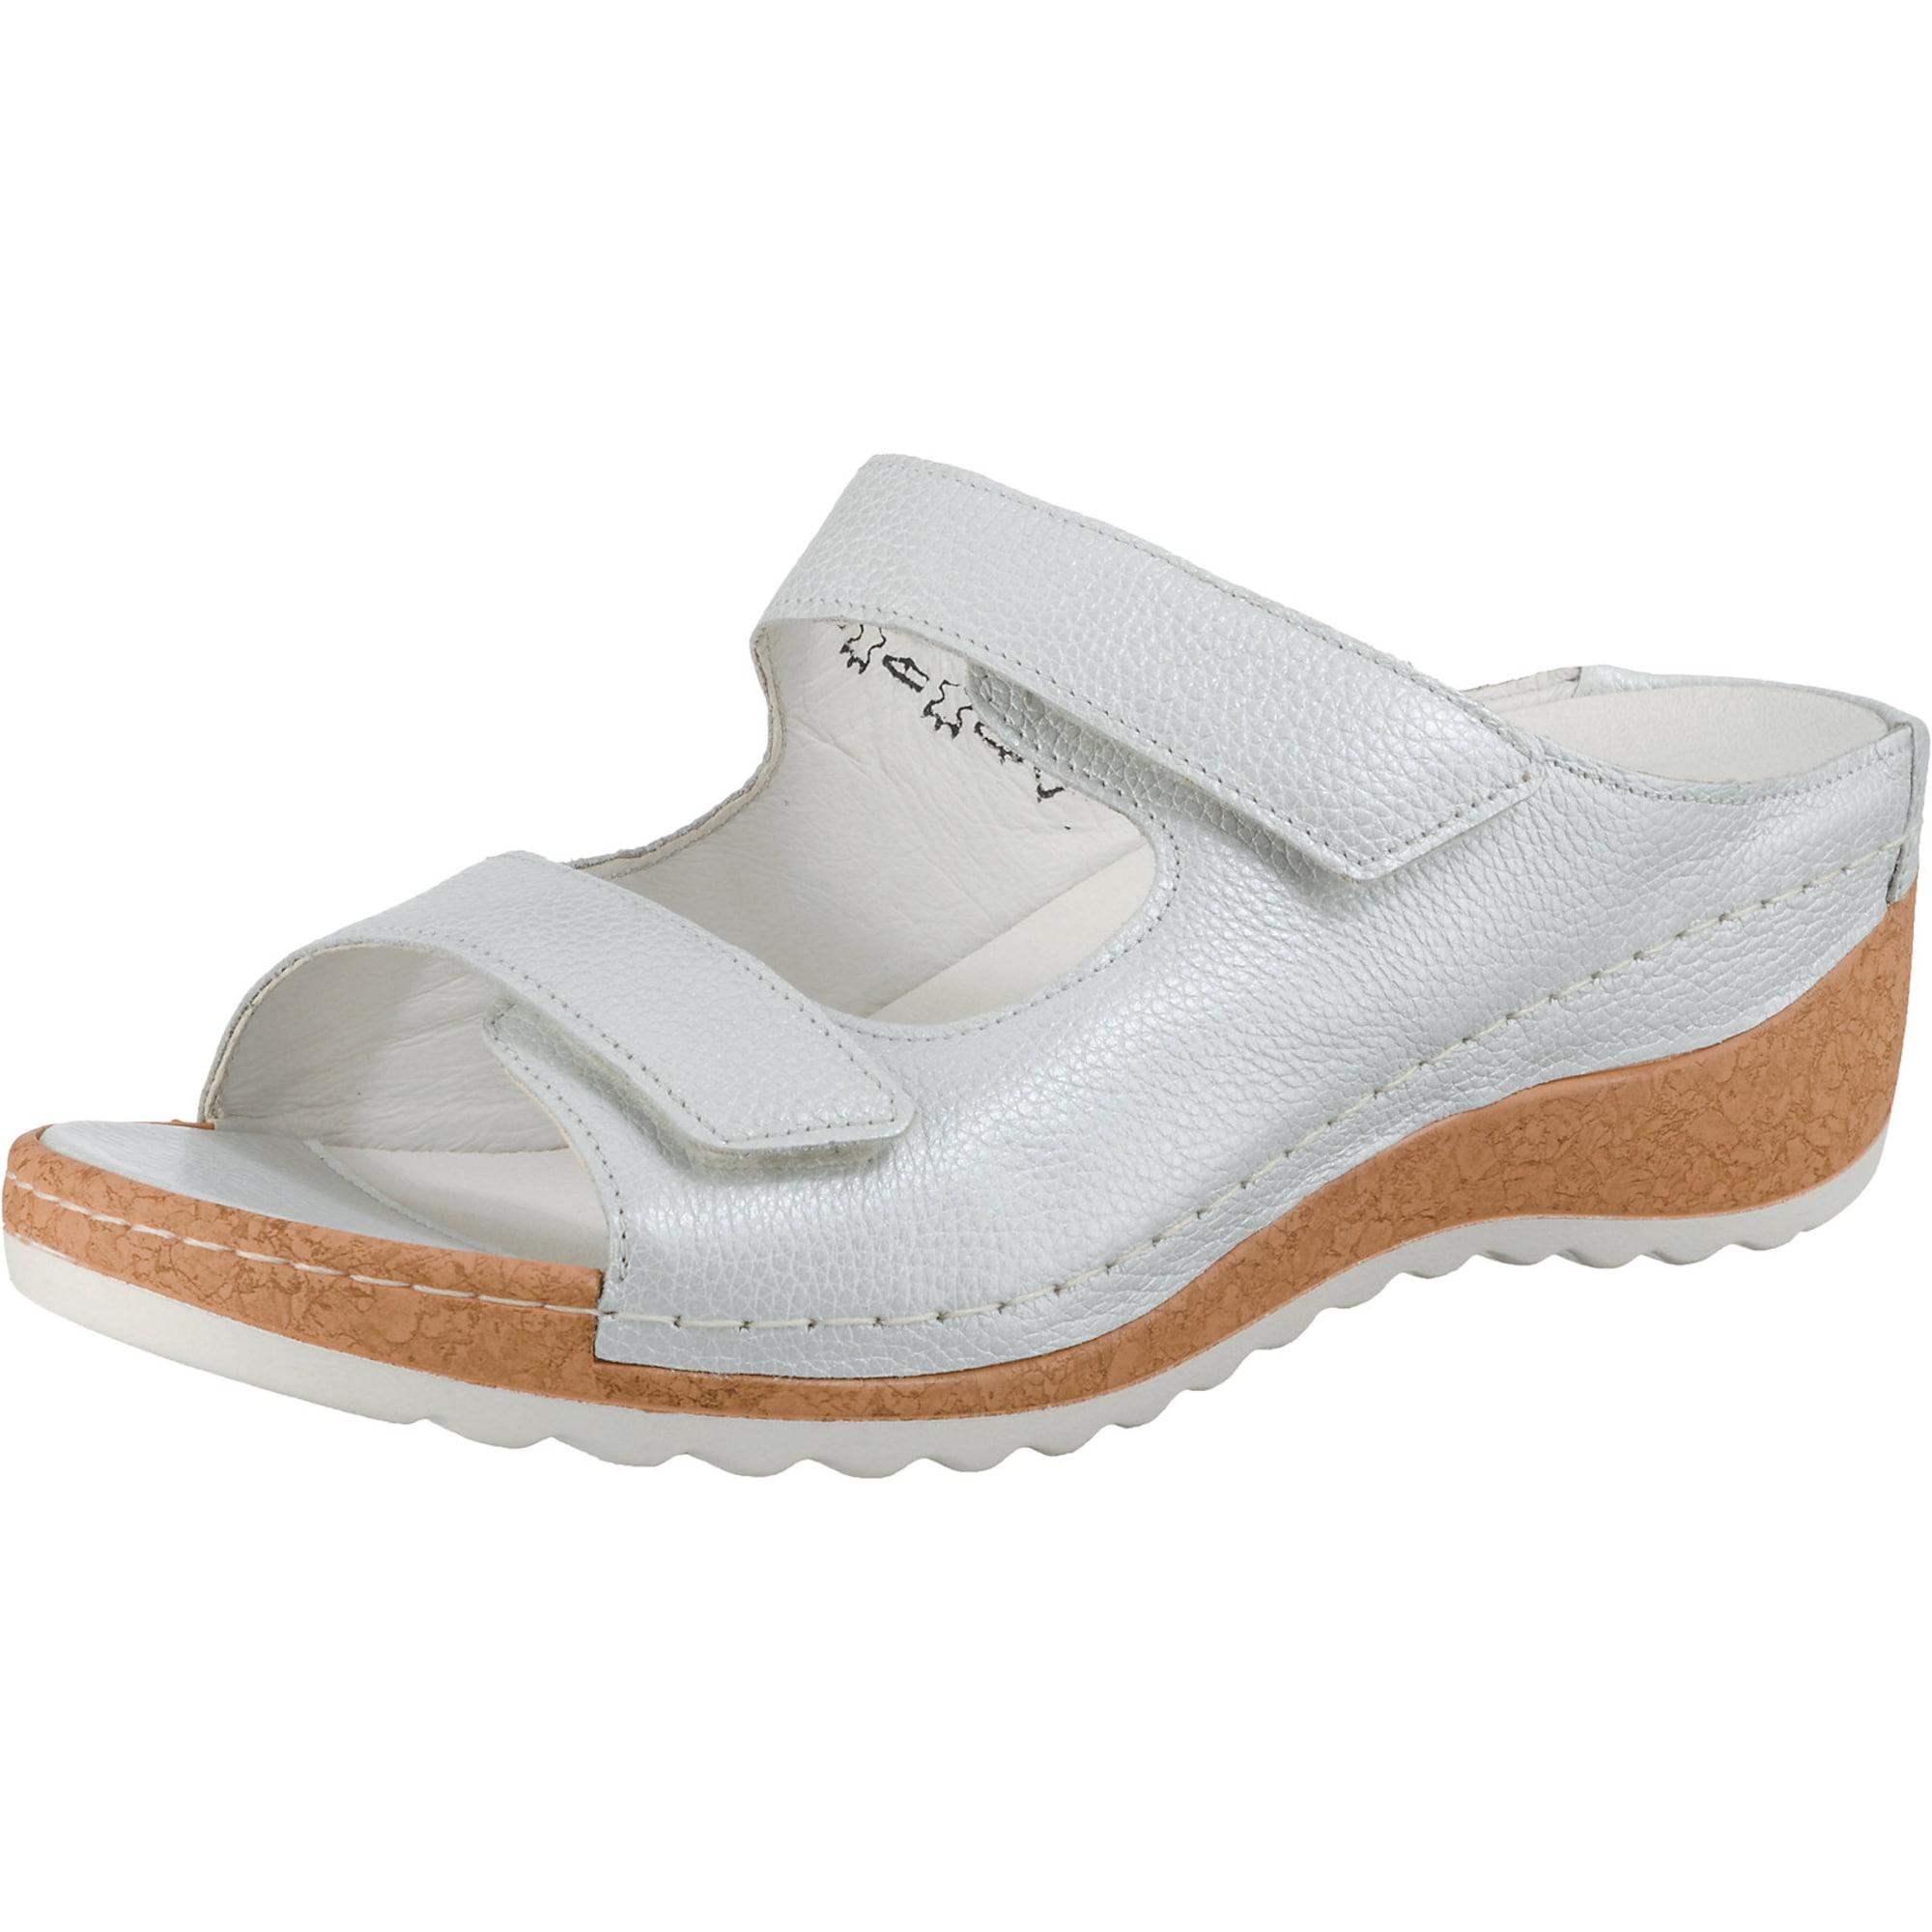 Pantoletten 'Hanila' | Schuhe > Clogs & Pantoletten | Weiß | WALDLÄUFER